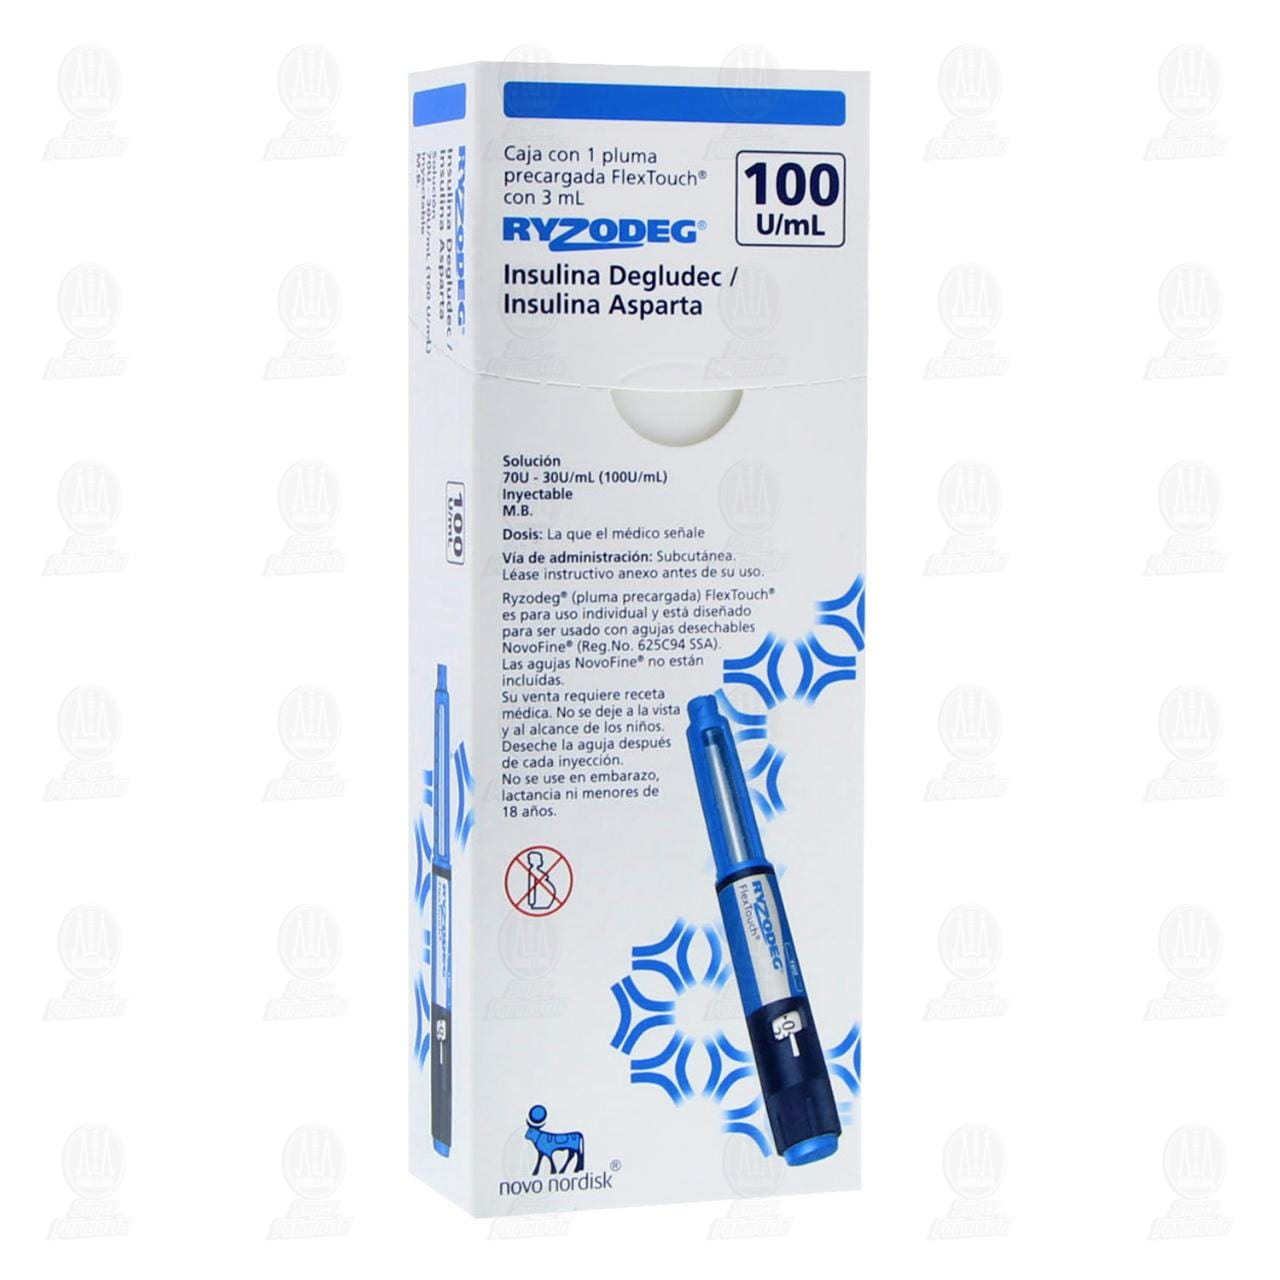 Comprar Ryzodeg Flex Touch 3ml Inyectable 1 Pluma en Farmacias Guadalajara